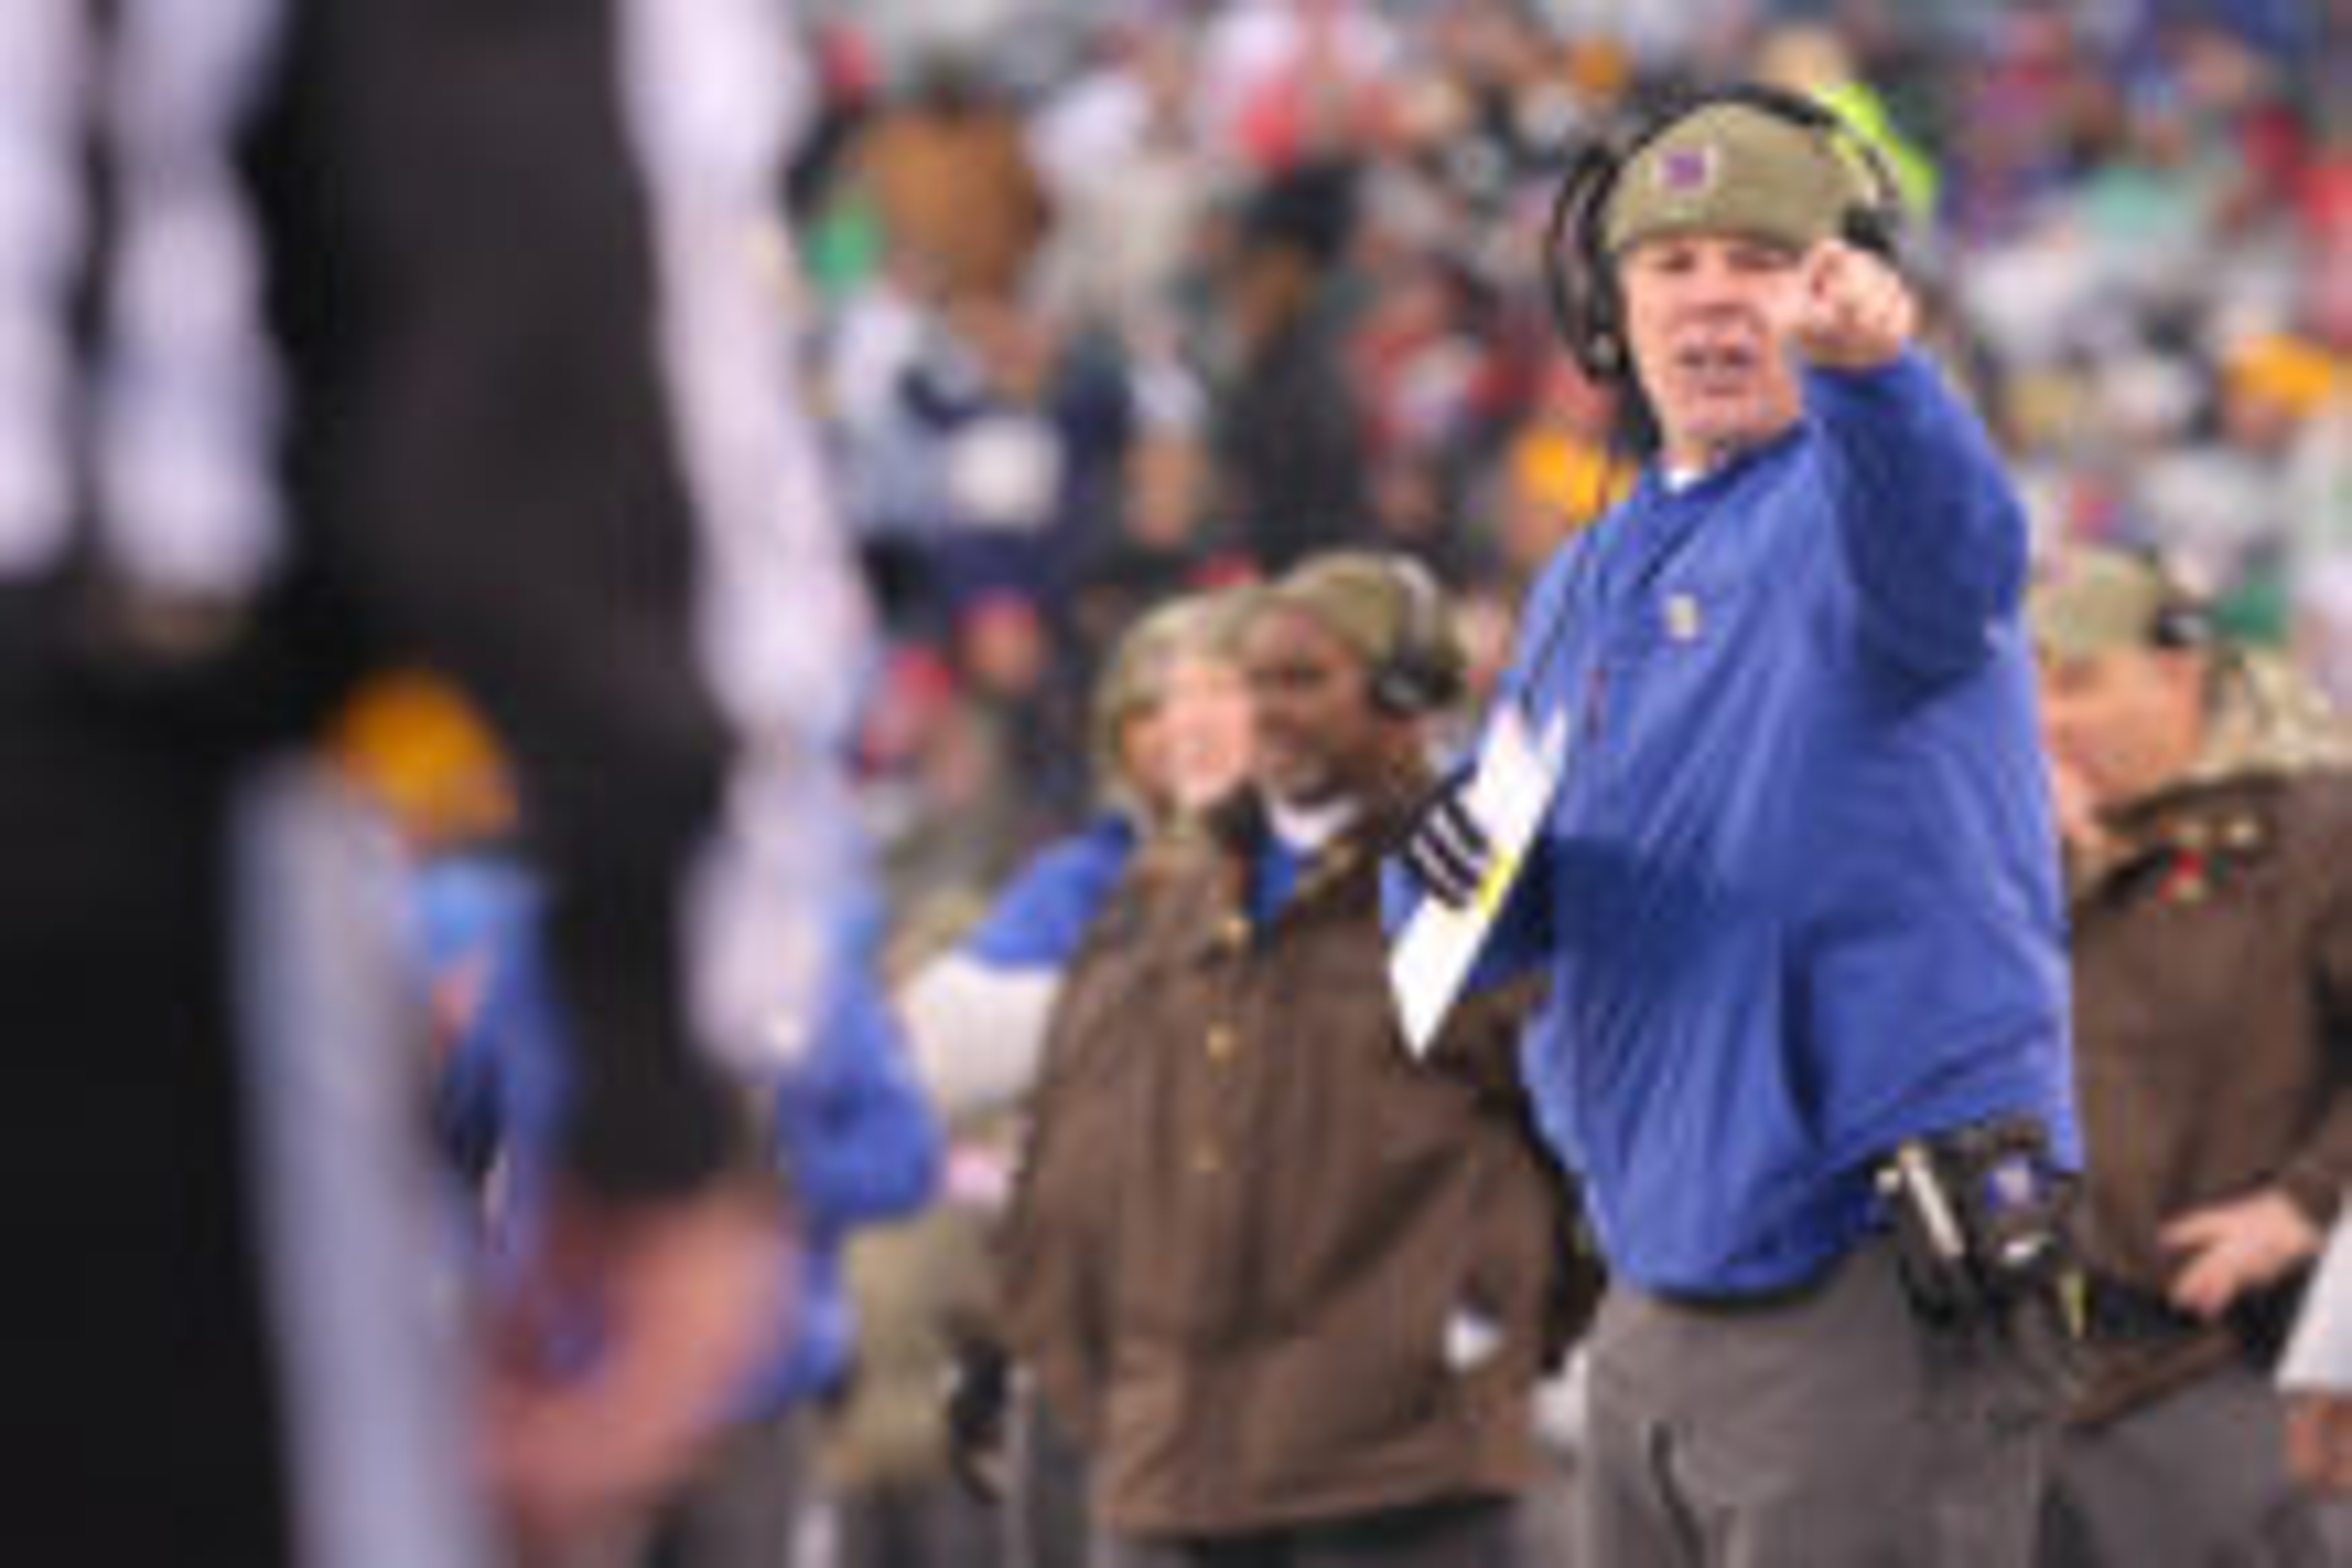 New York Giants head coach Pat Shurmur yells at side judge Jeff Lamberth (21) during the third quarter against the Green Bay Packers at MetLife Stadium.